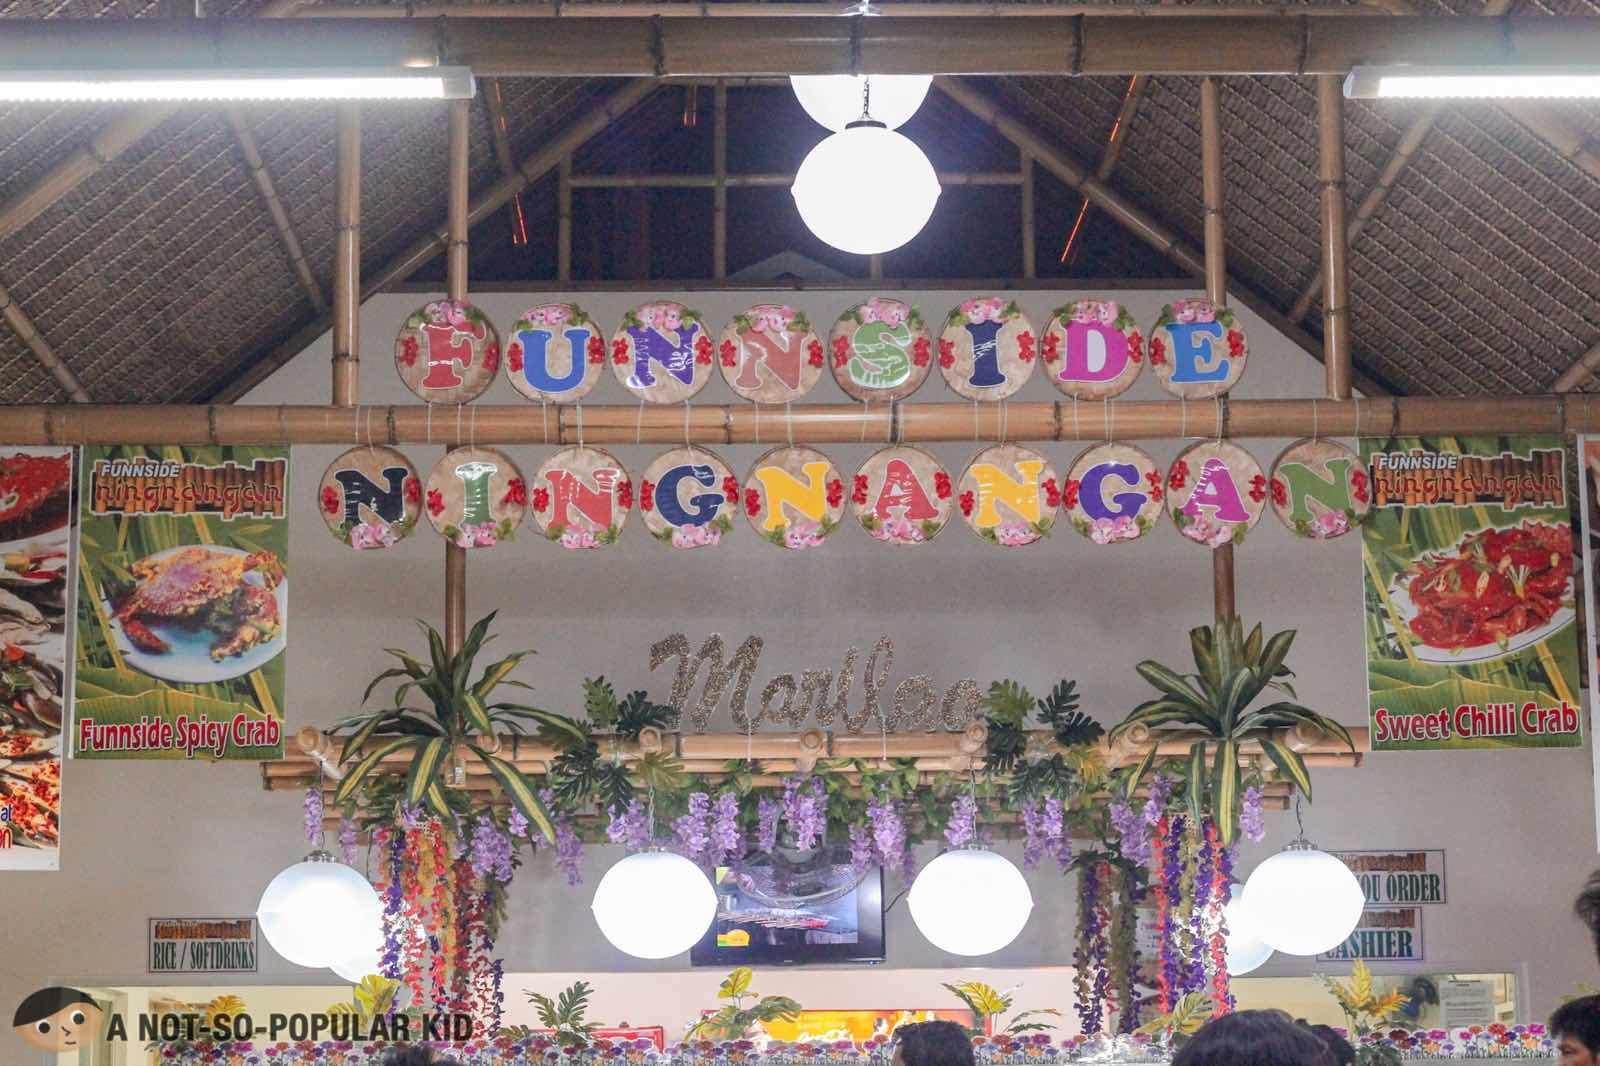 Funnside Ningnangan in Marilao, Bulacan